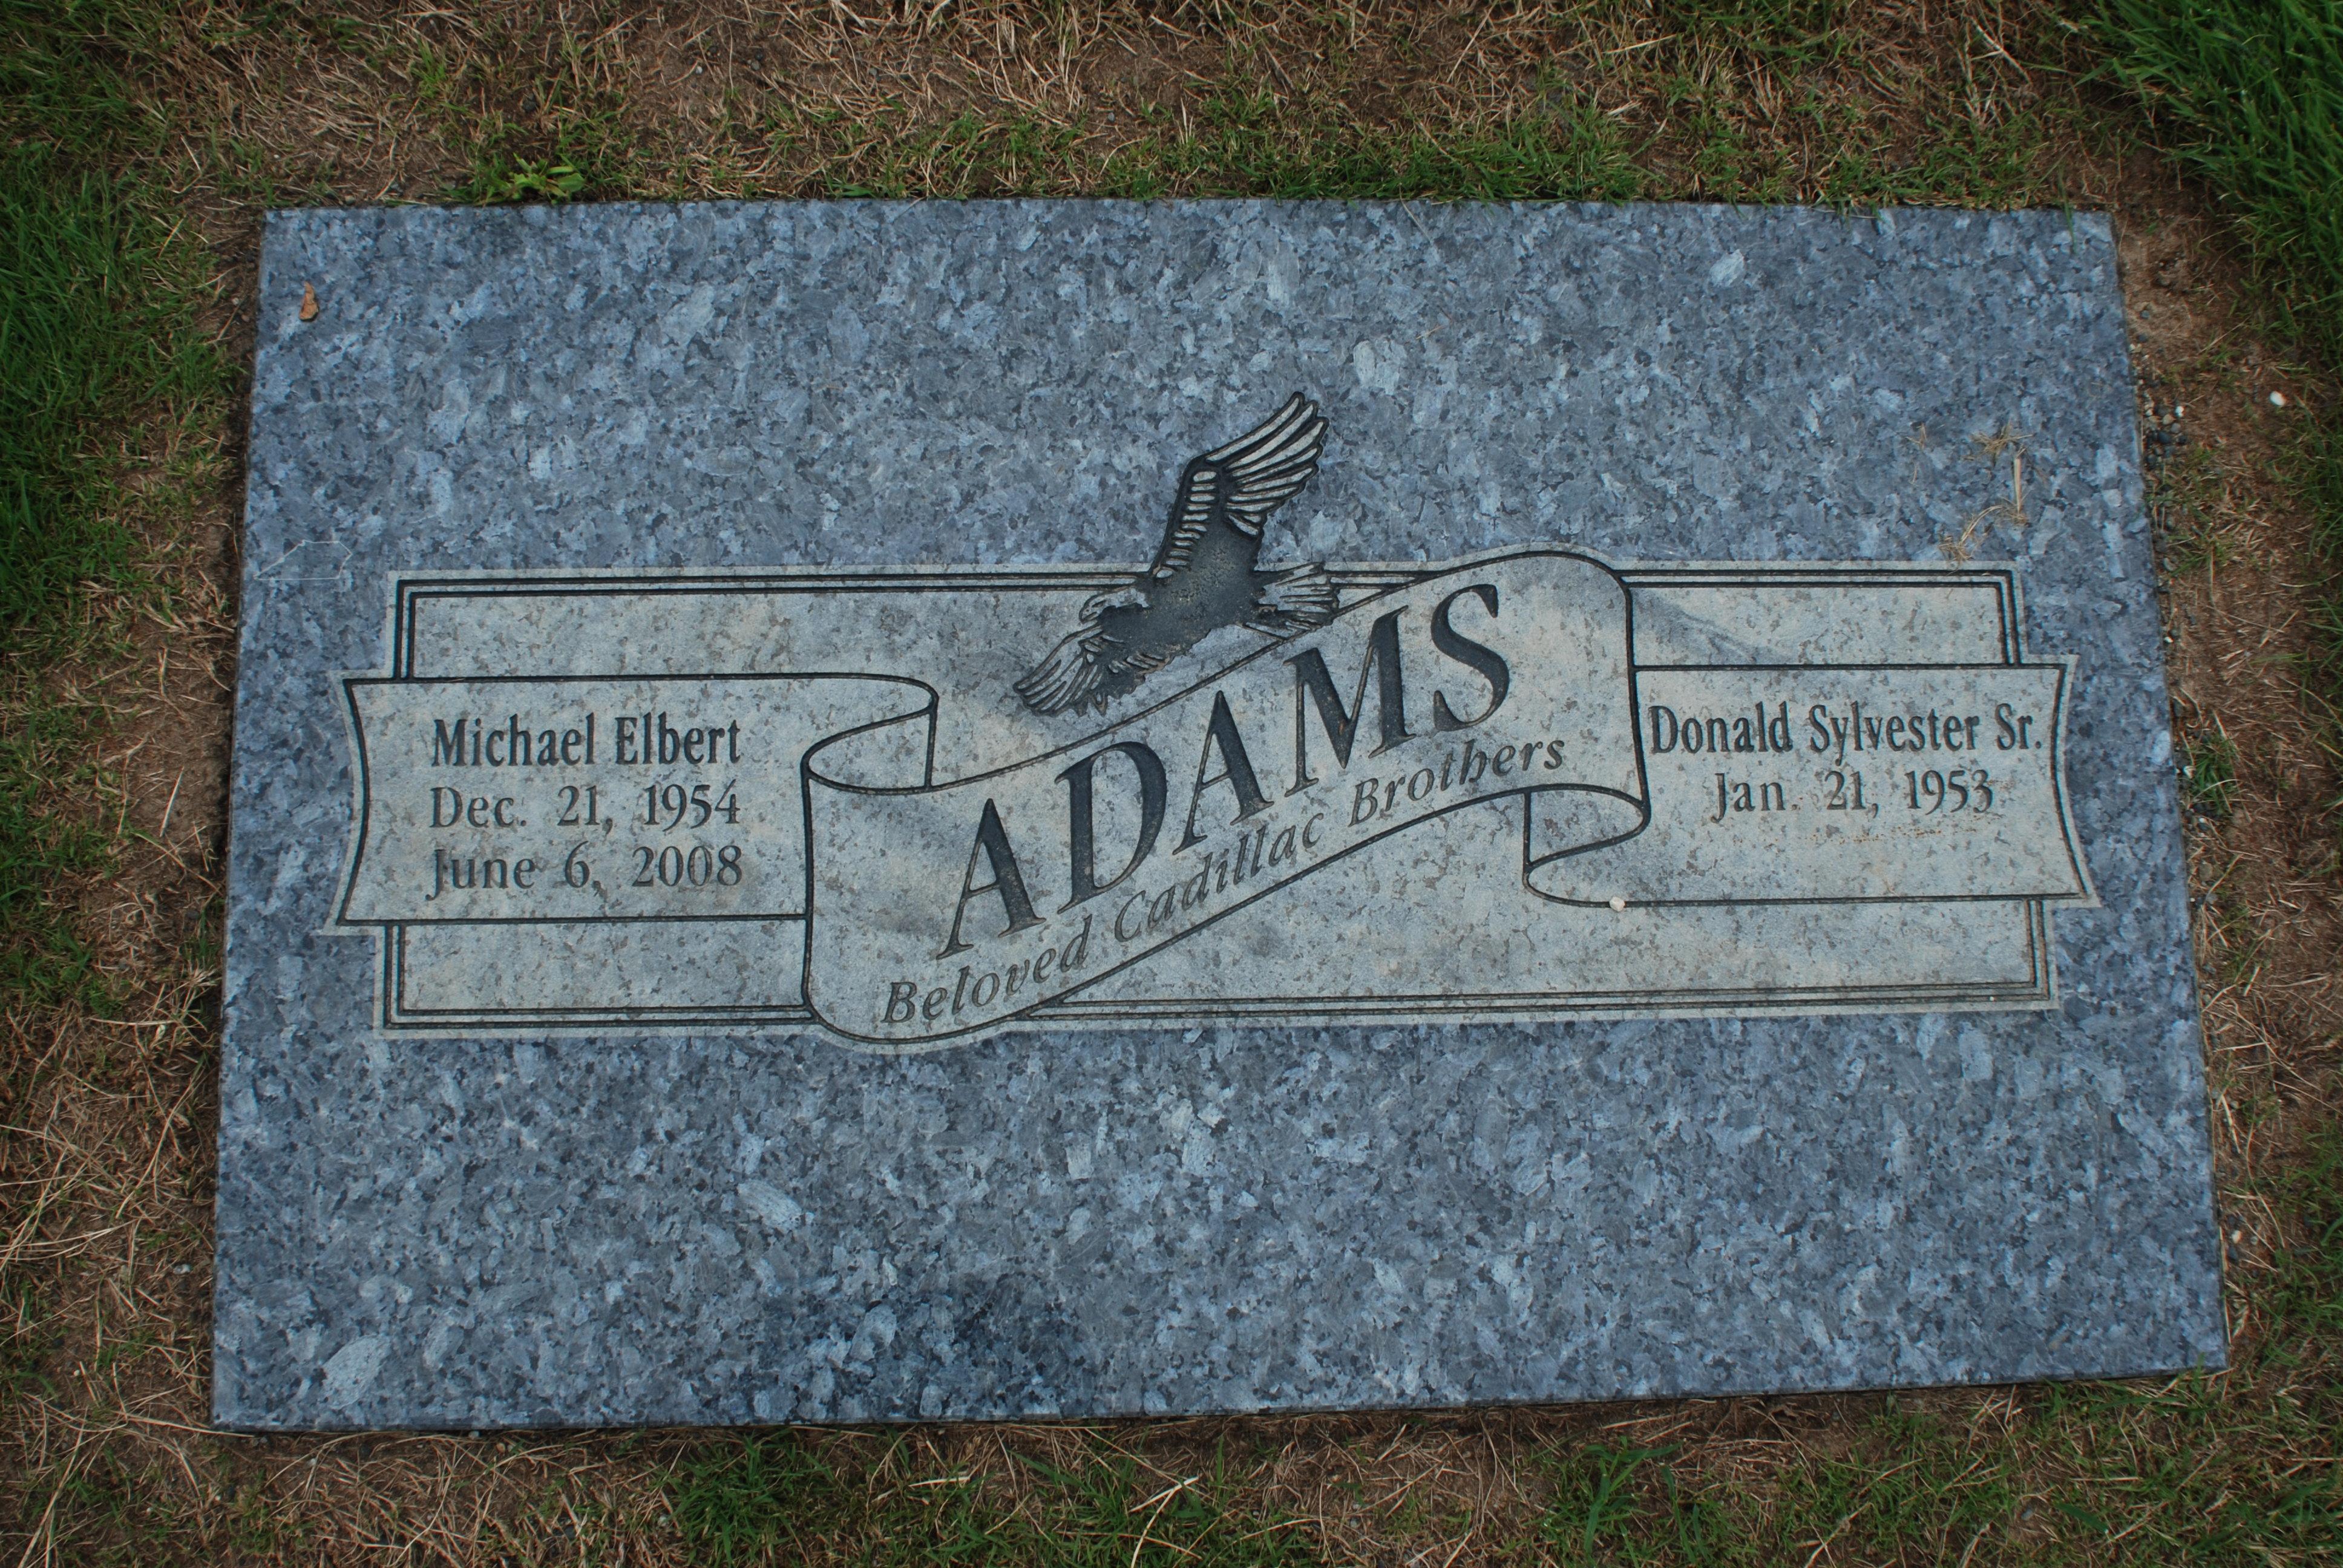 Michael Elbert Adams